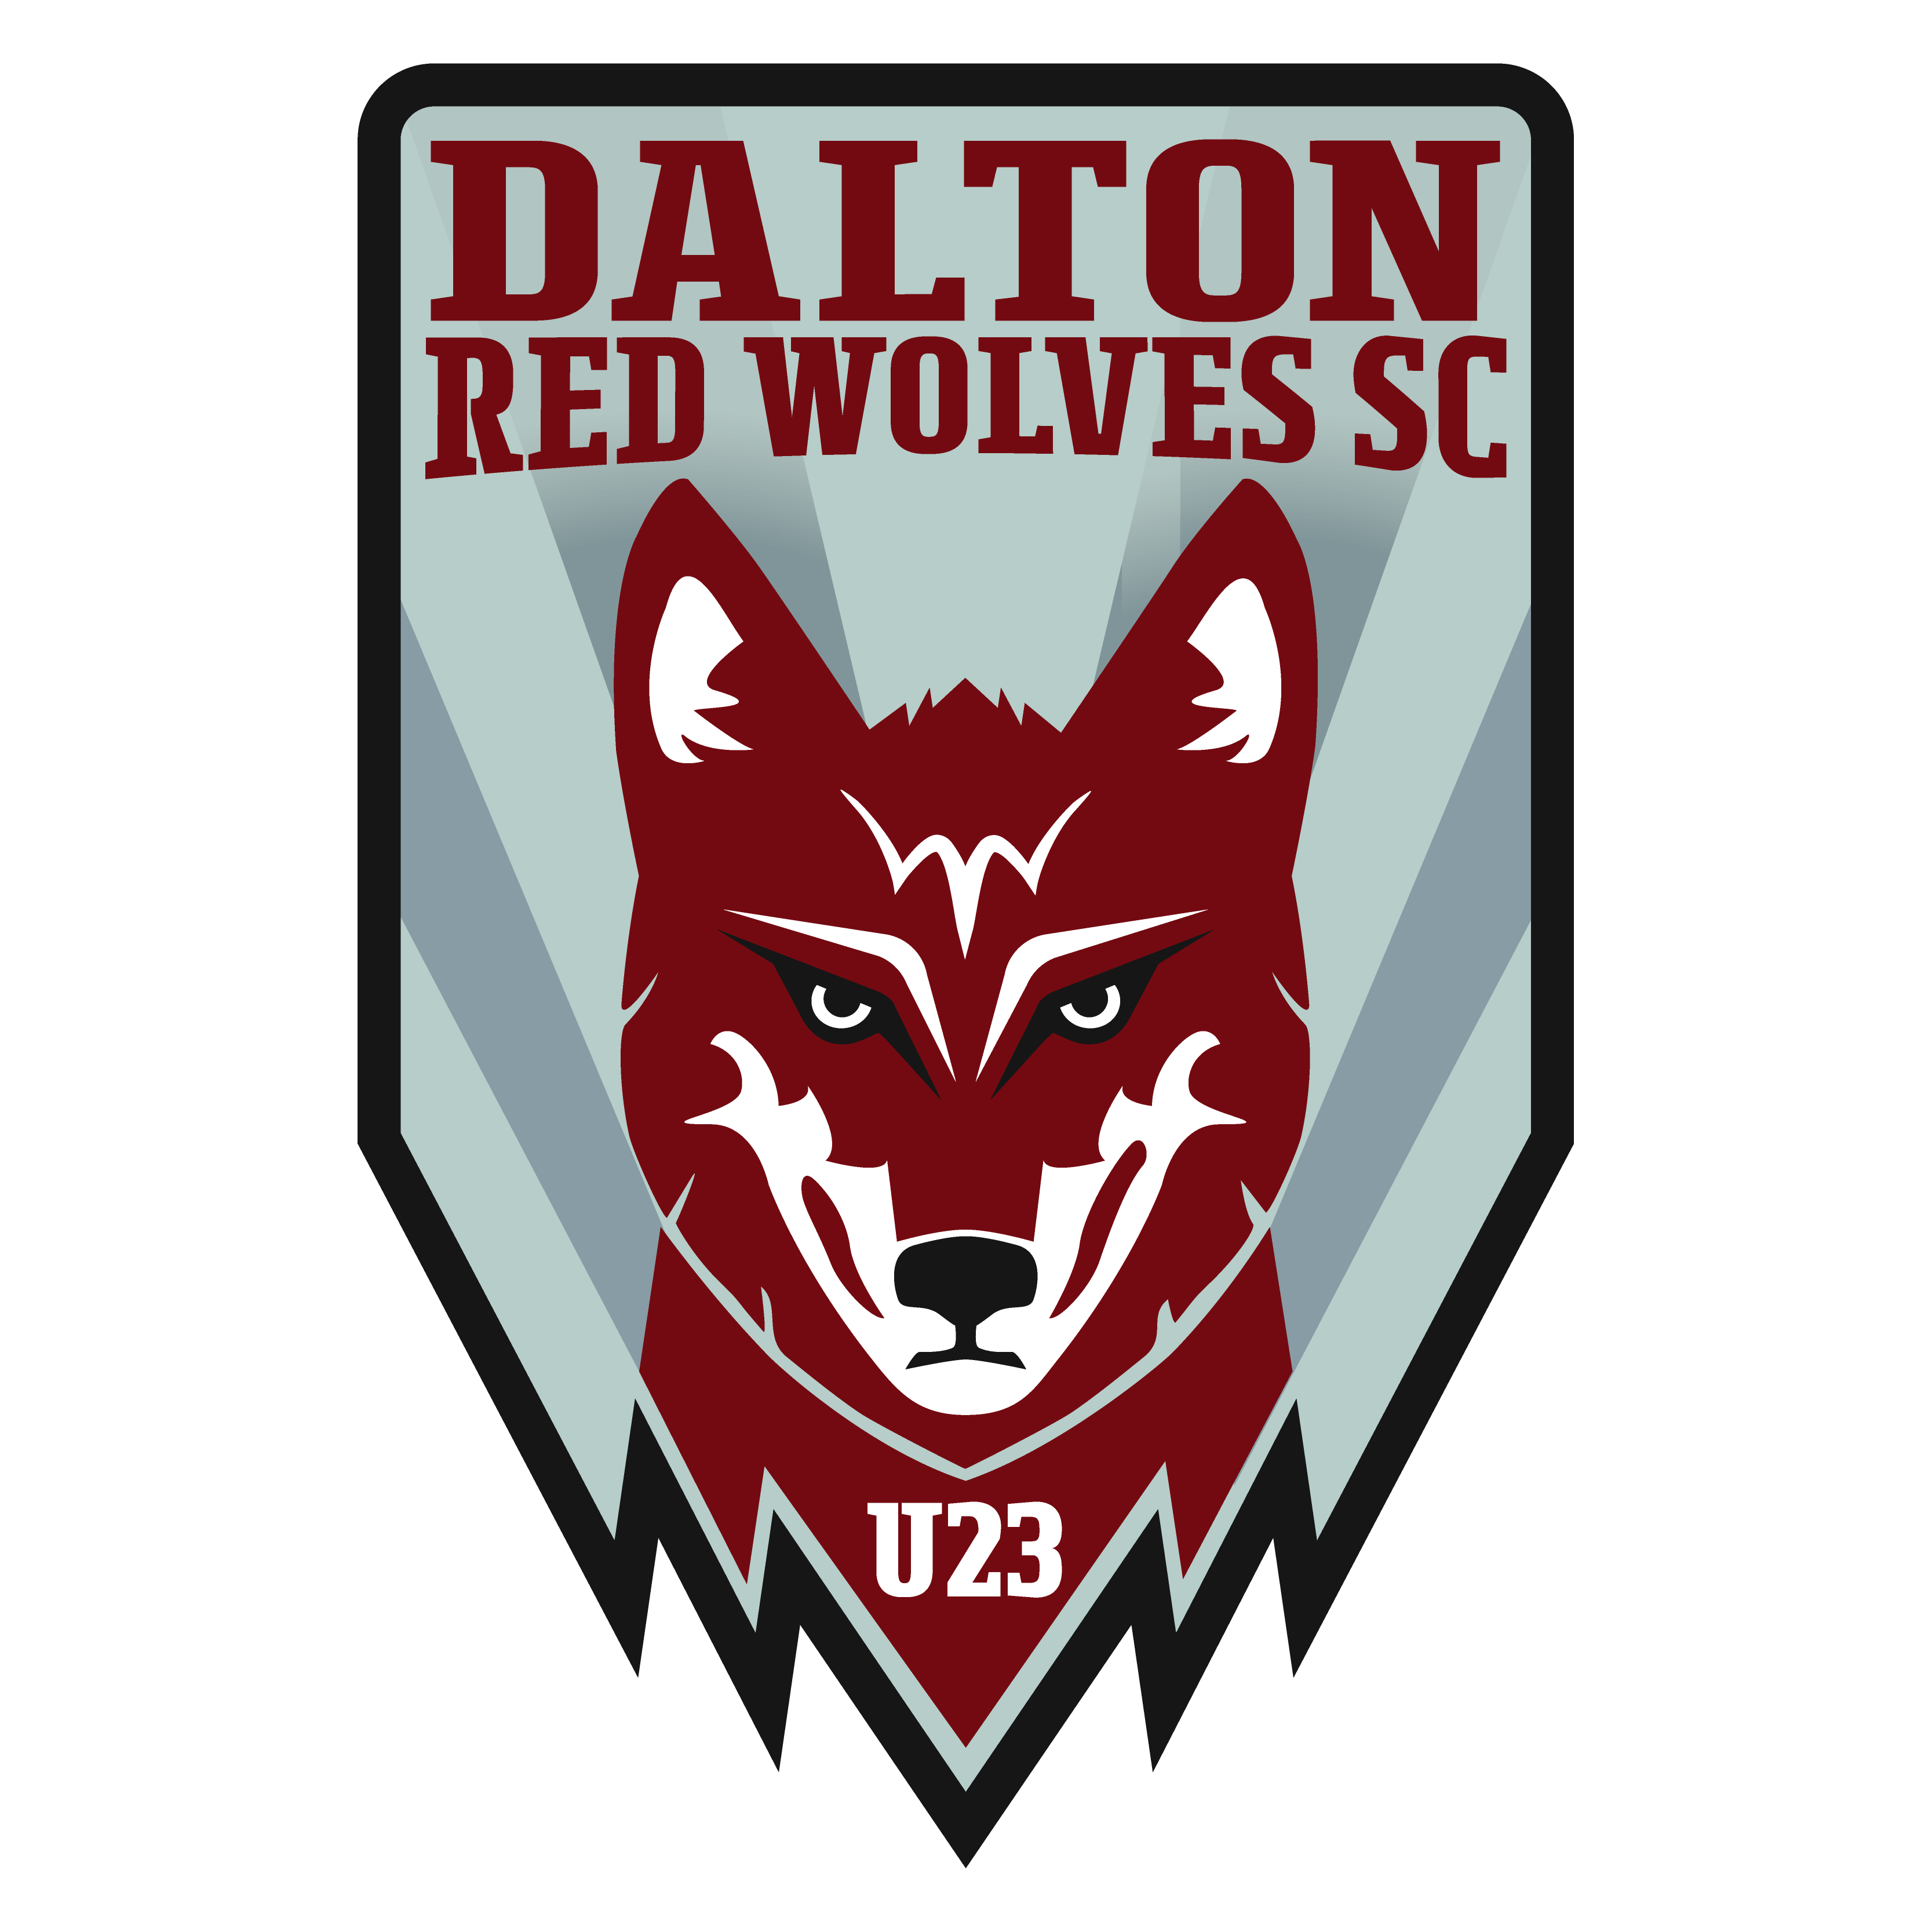 Dalton Red Wolves